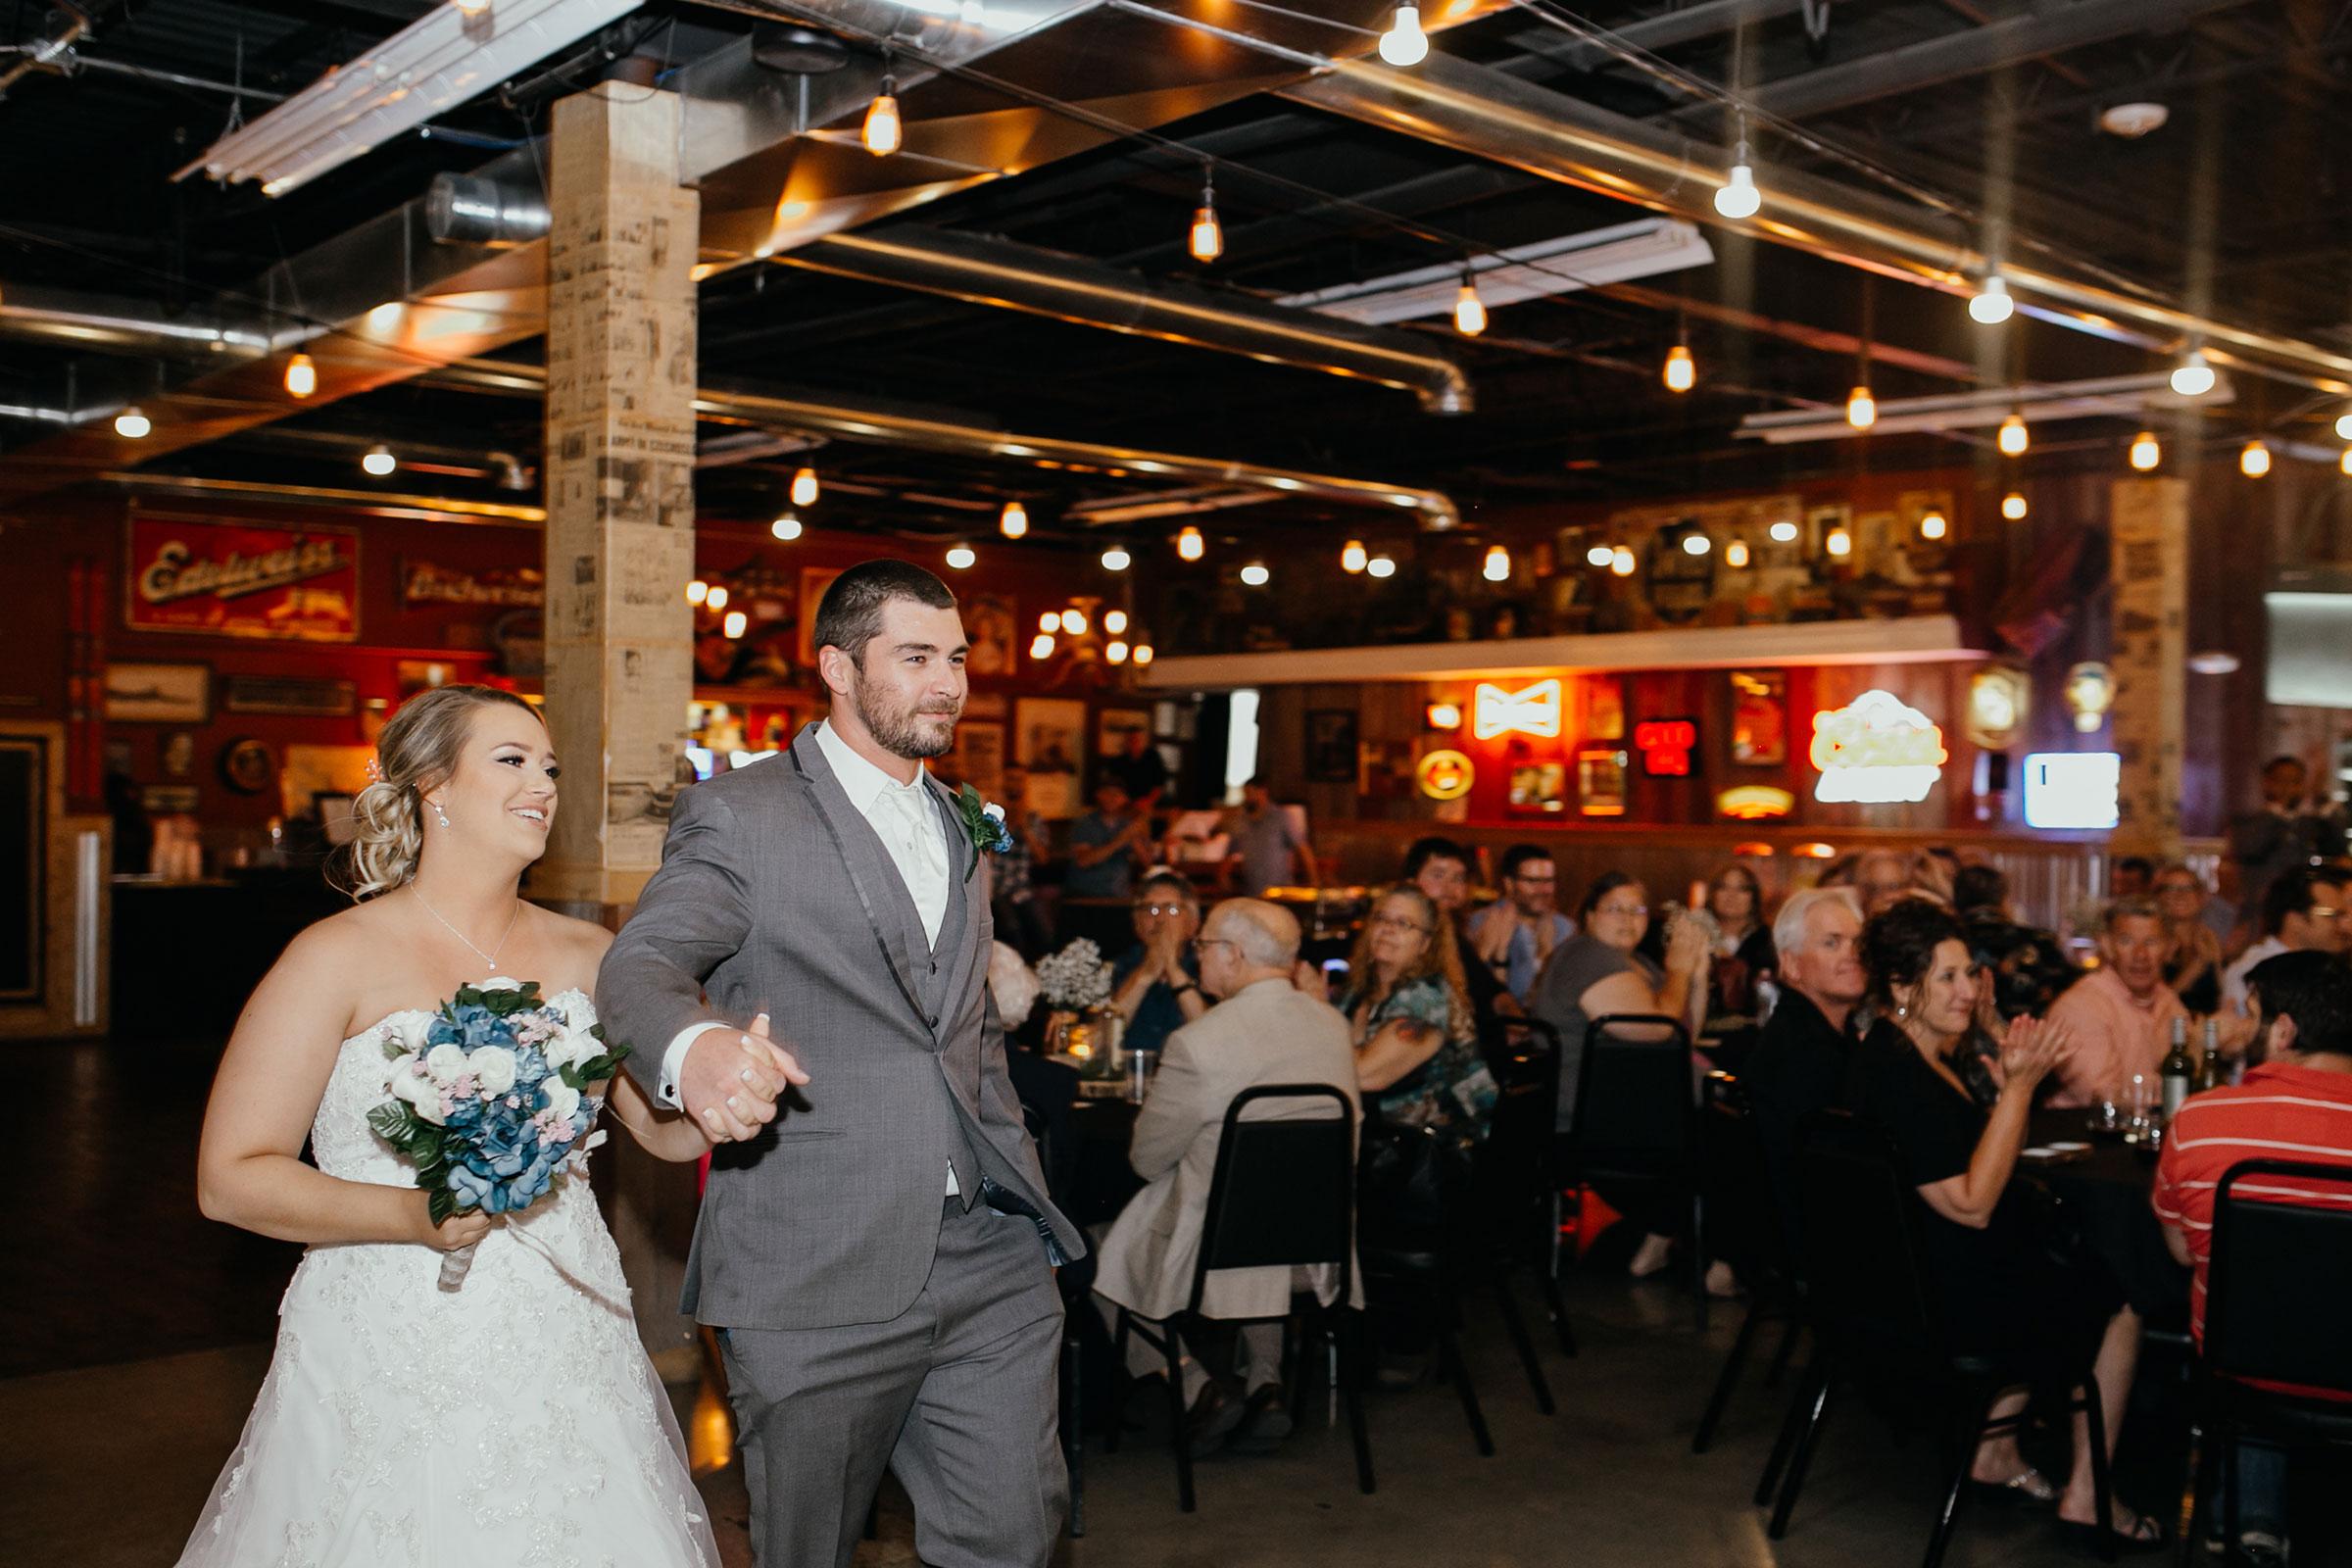 bride-groom-enterance-holding-hands-decades-event-center-building-desmoines-iowa-raelyn-ramey-photography..jpg